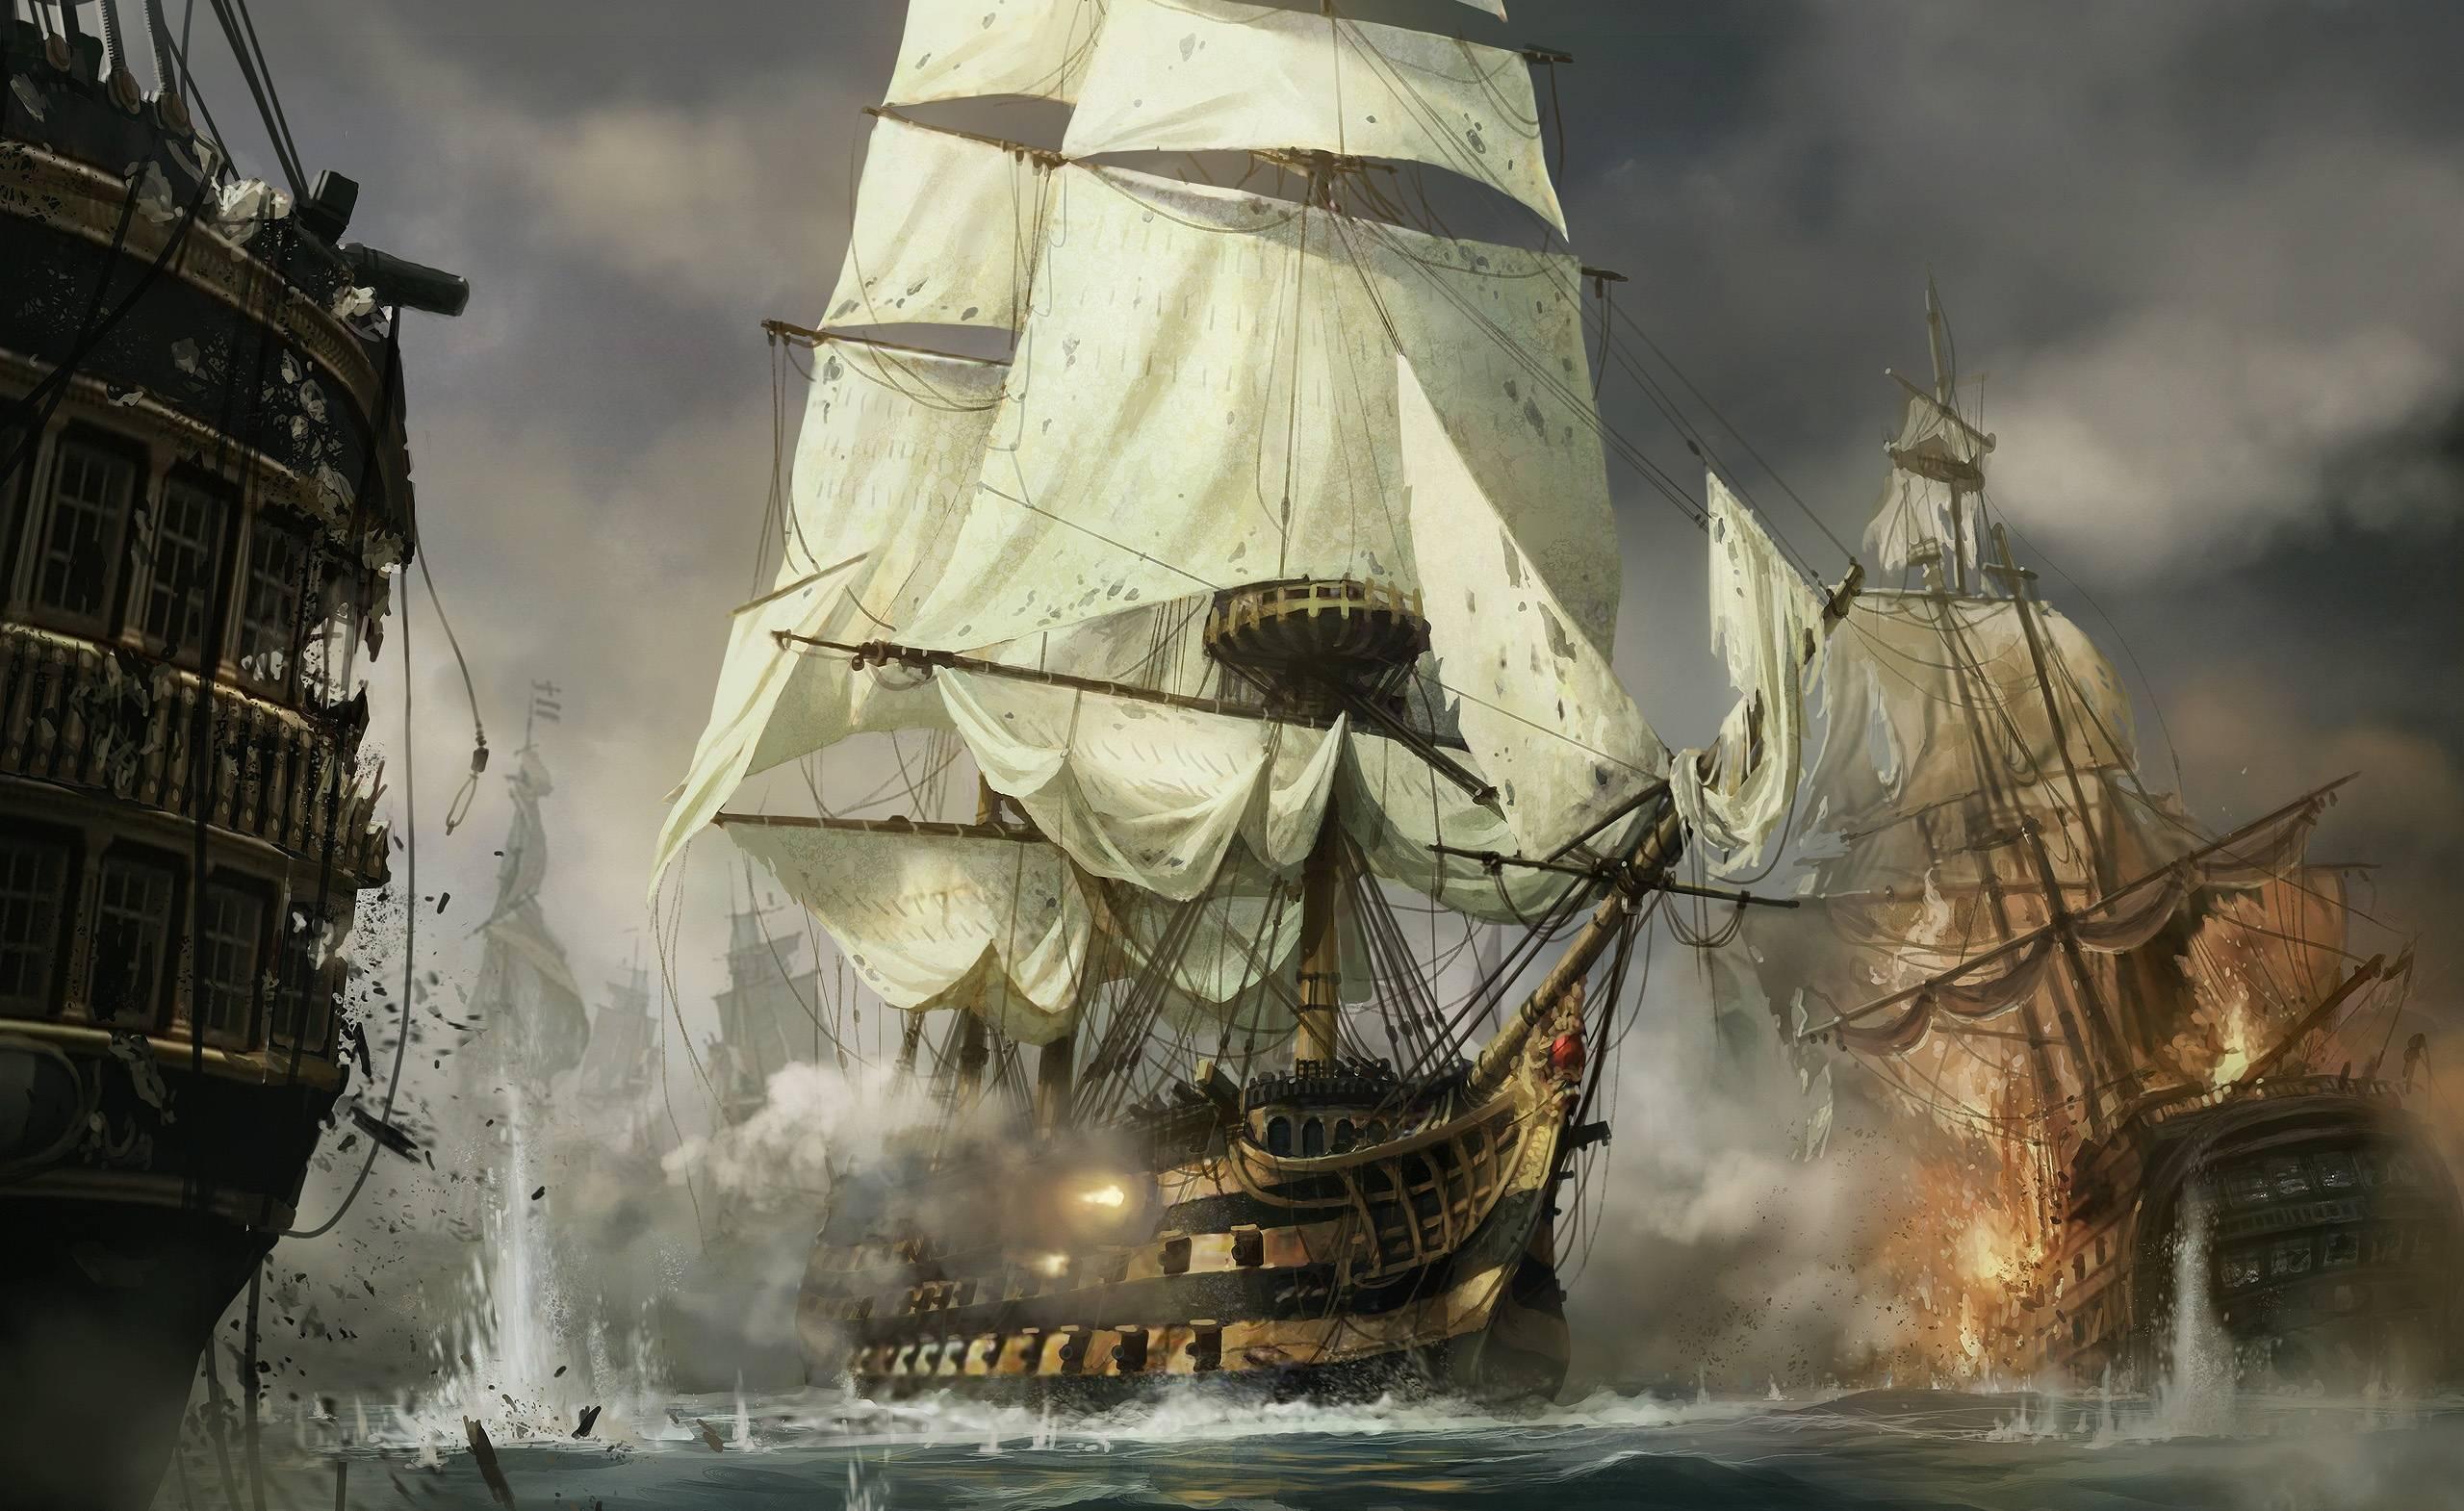 Best 54 Spanish Armada Wallpaper on HipWallpaper Spanish Armada 2560x1570